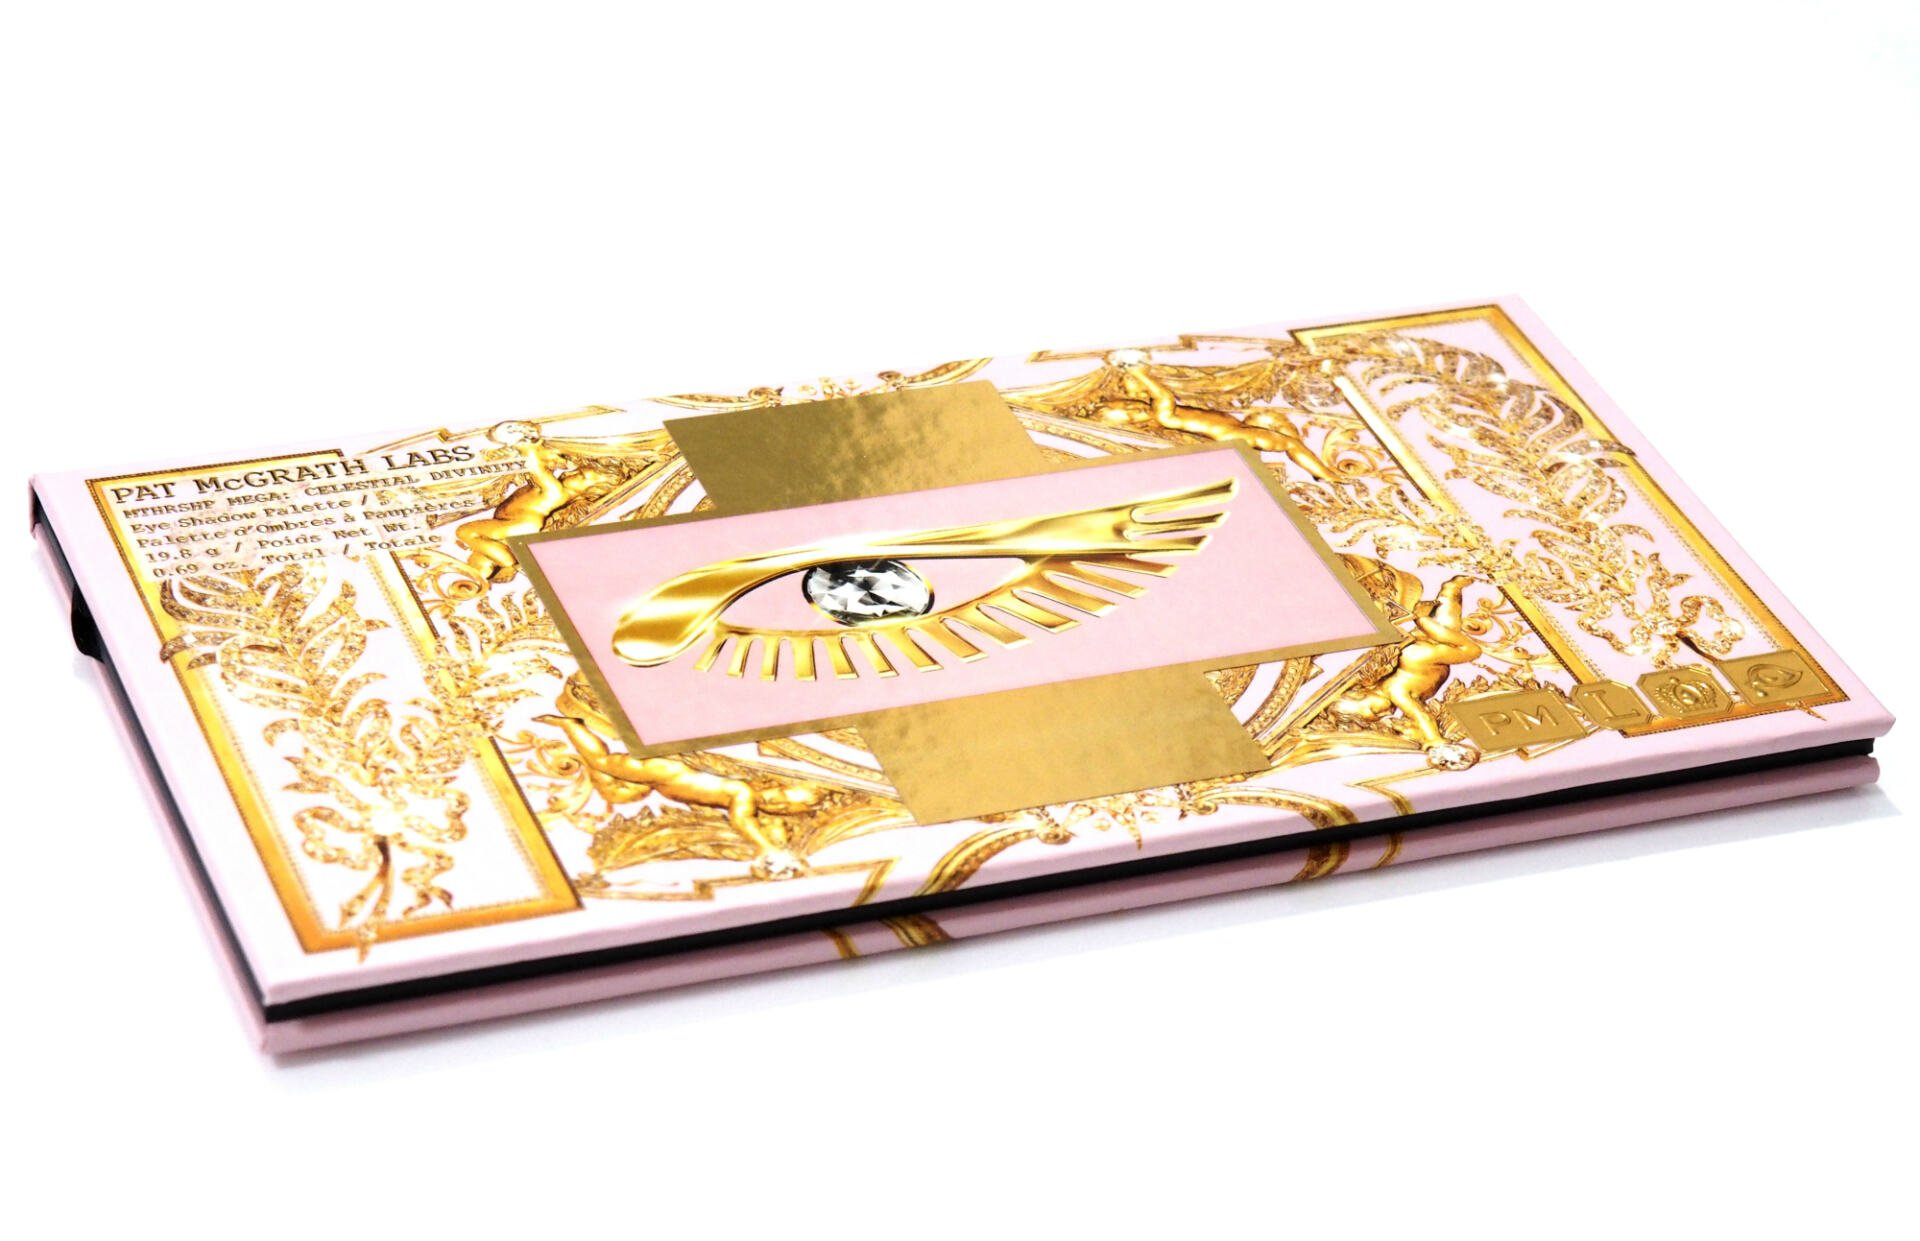 Pat McGrath Mthrship Mega Celestial Divinity Eyeshadow Palette Review / Swatches